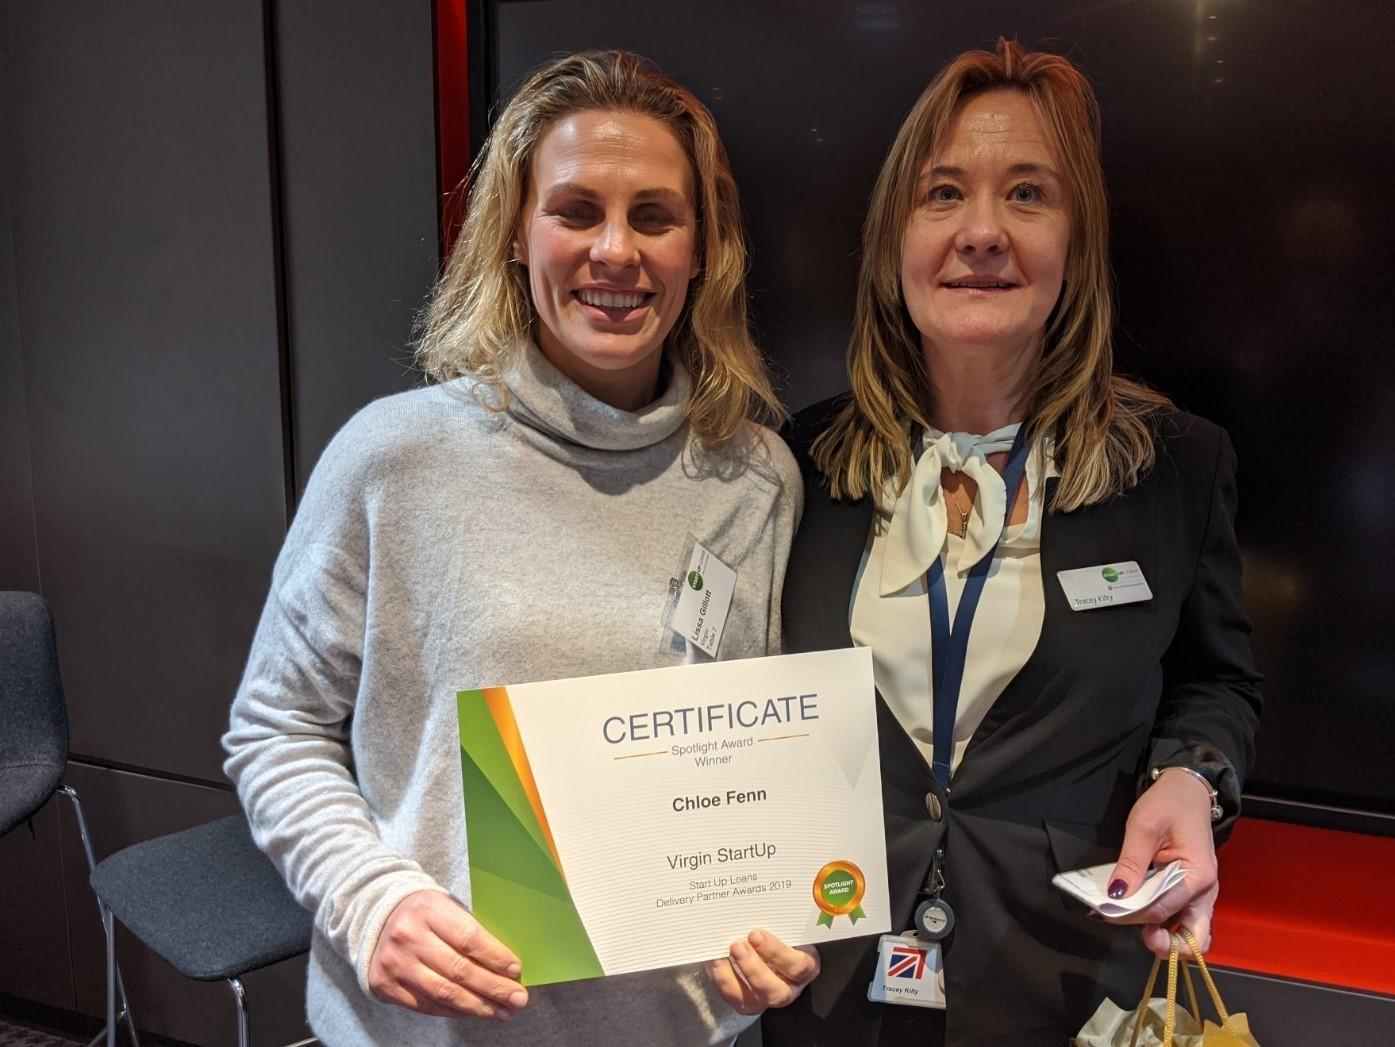 Tracey Kilty presenting a certificate to Chloe Fenn